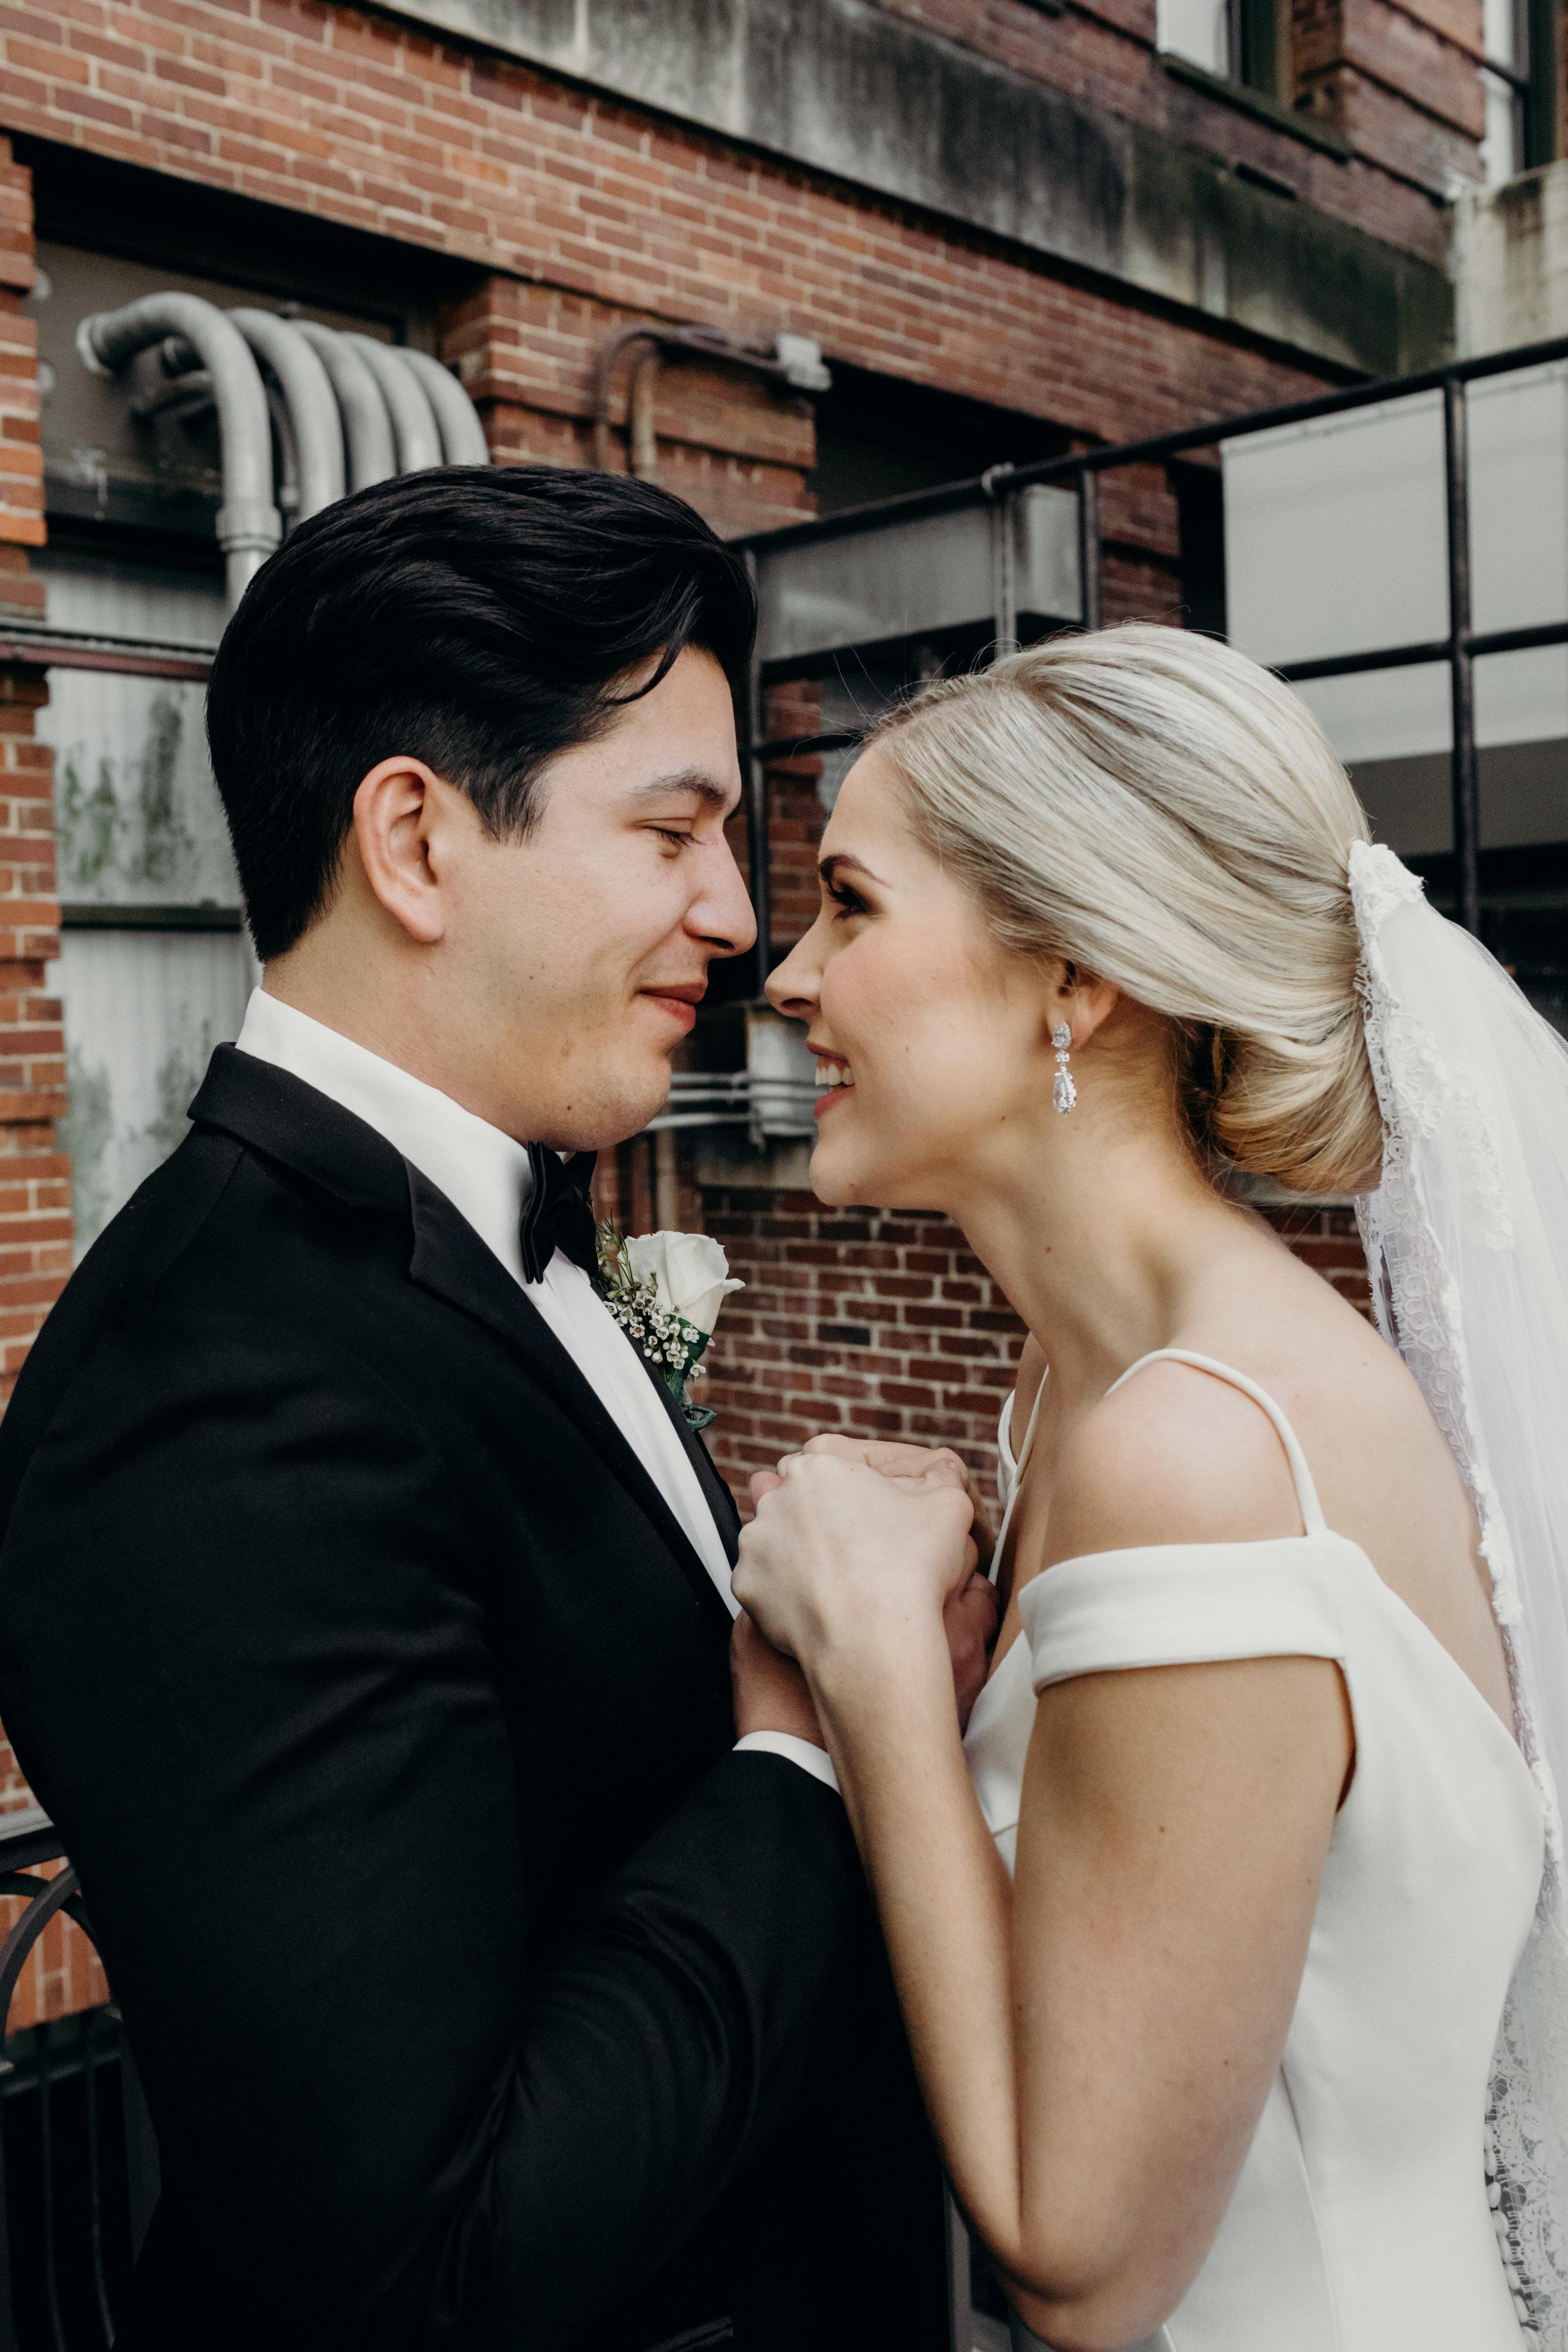 spring-classic-wedding-downtown3-19.jpg